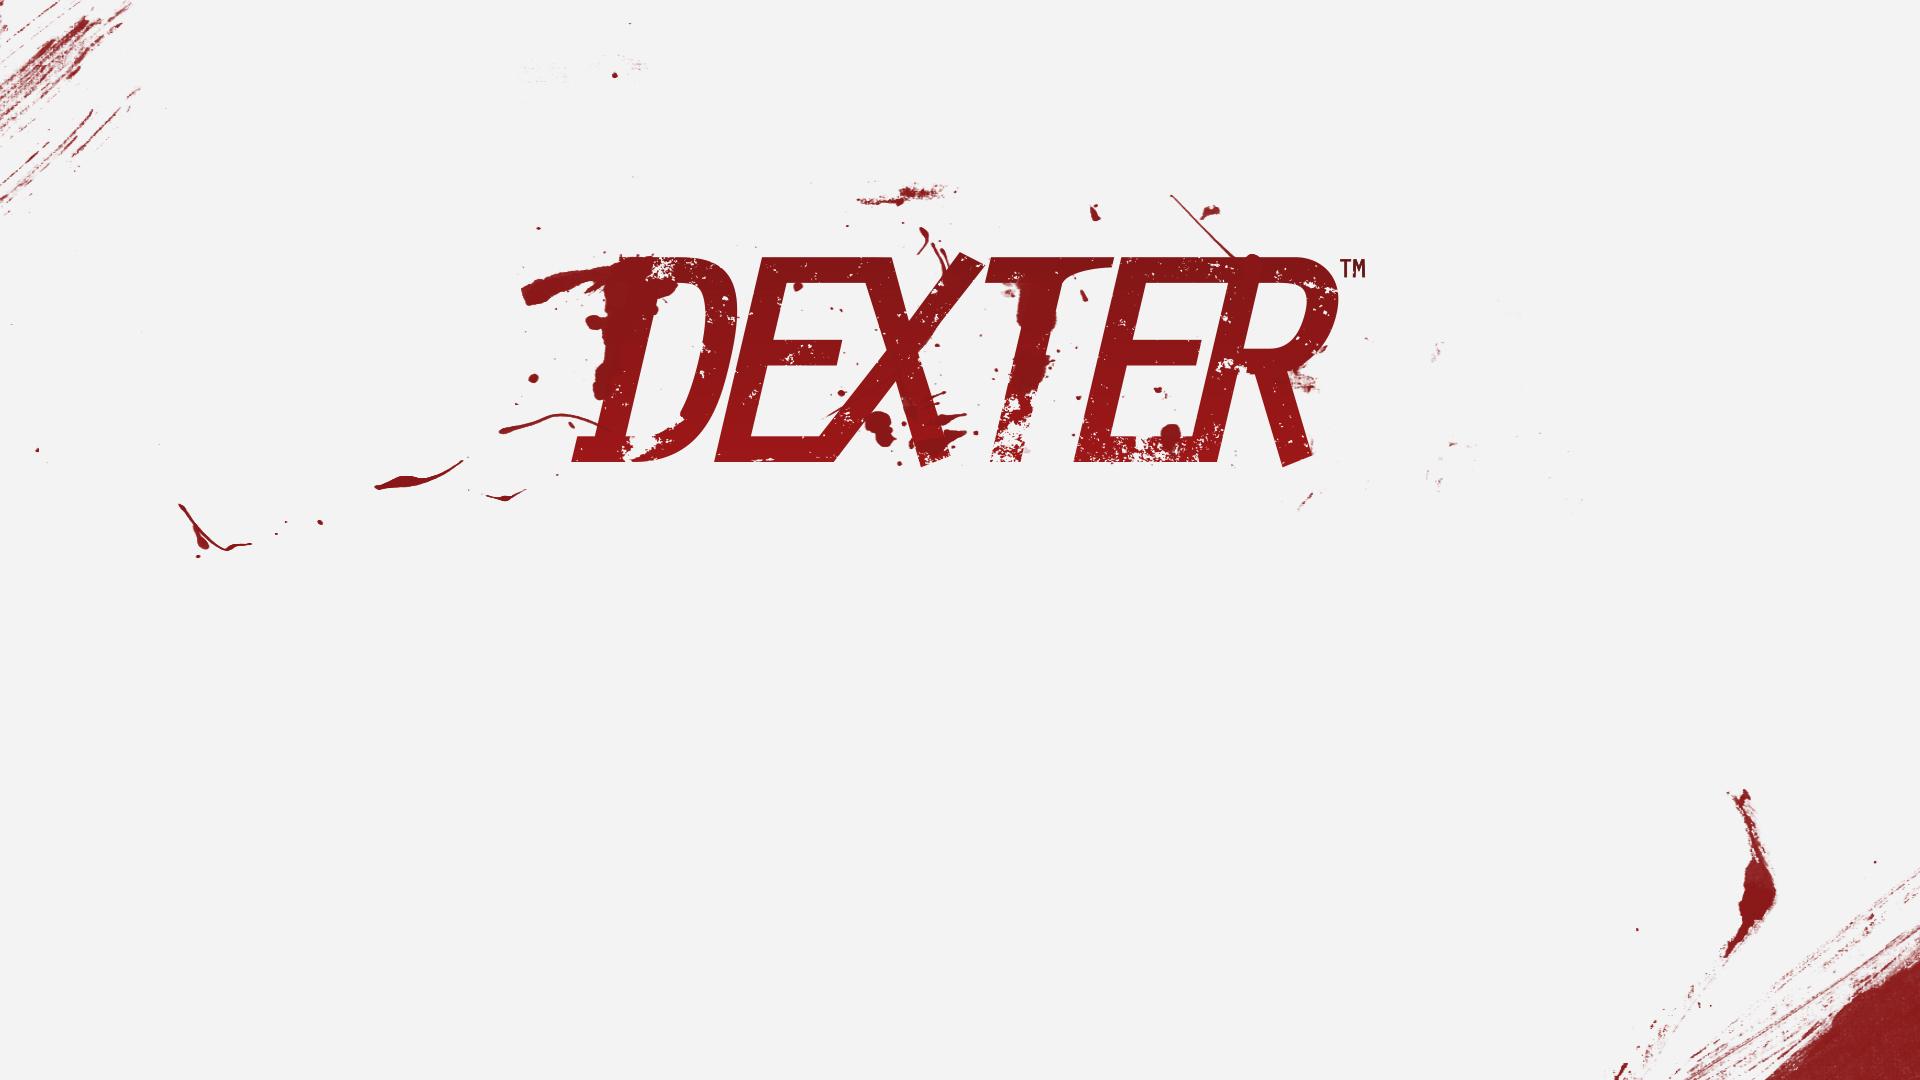 Dexter wallpaper for desktop (7)